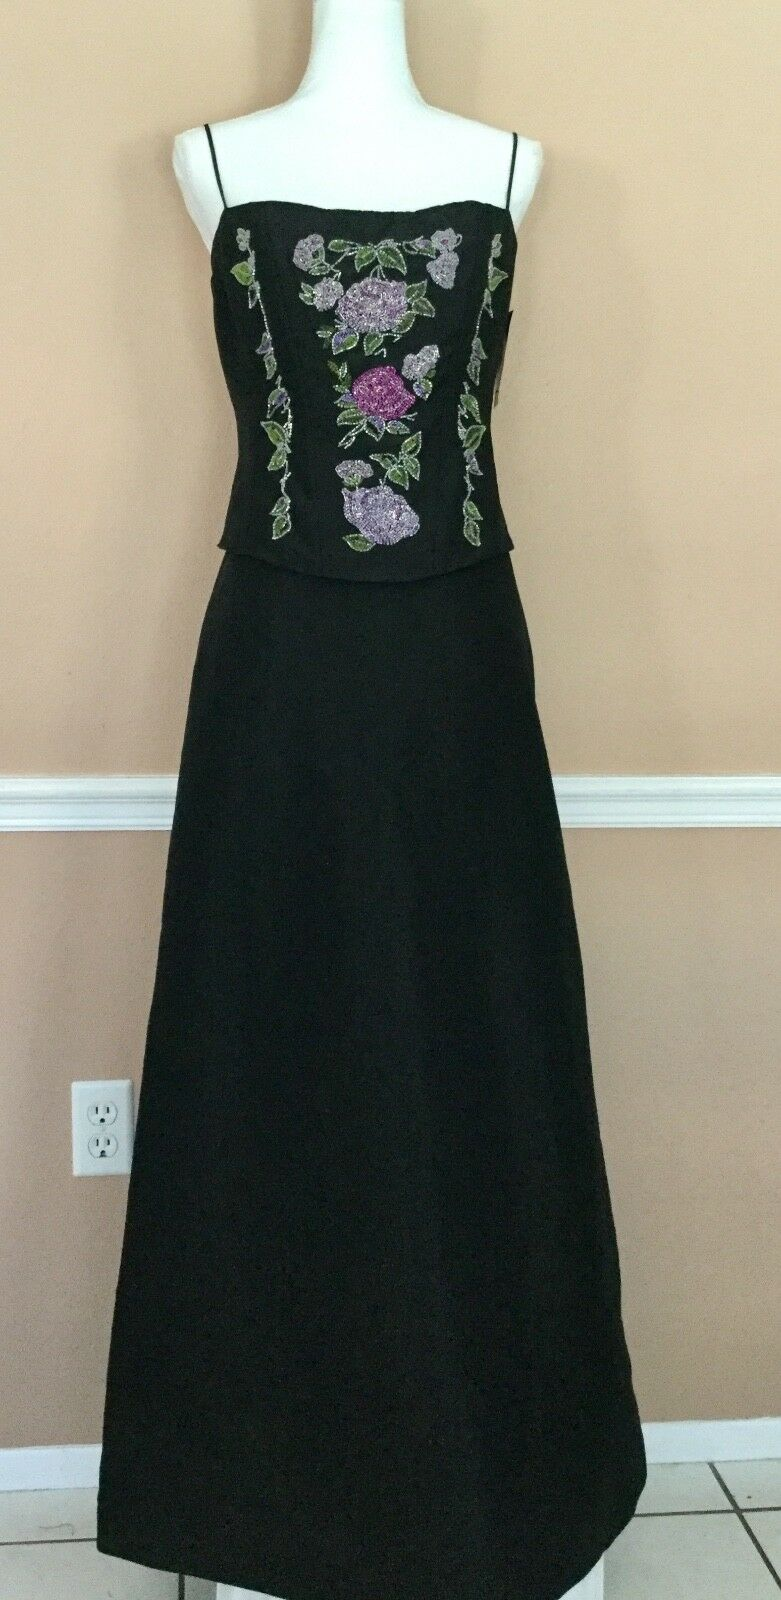 Nicole Miller schwarz Satin Floral Beaded Spaghetti Strap Evening  Gown  Dress 10